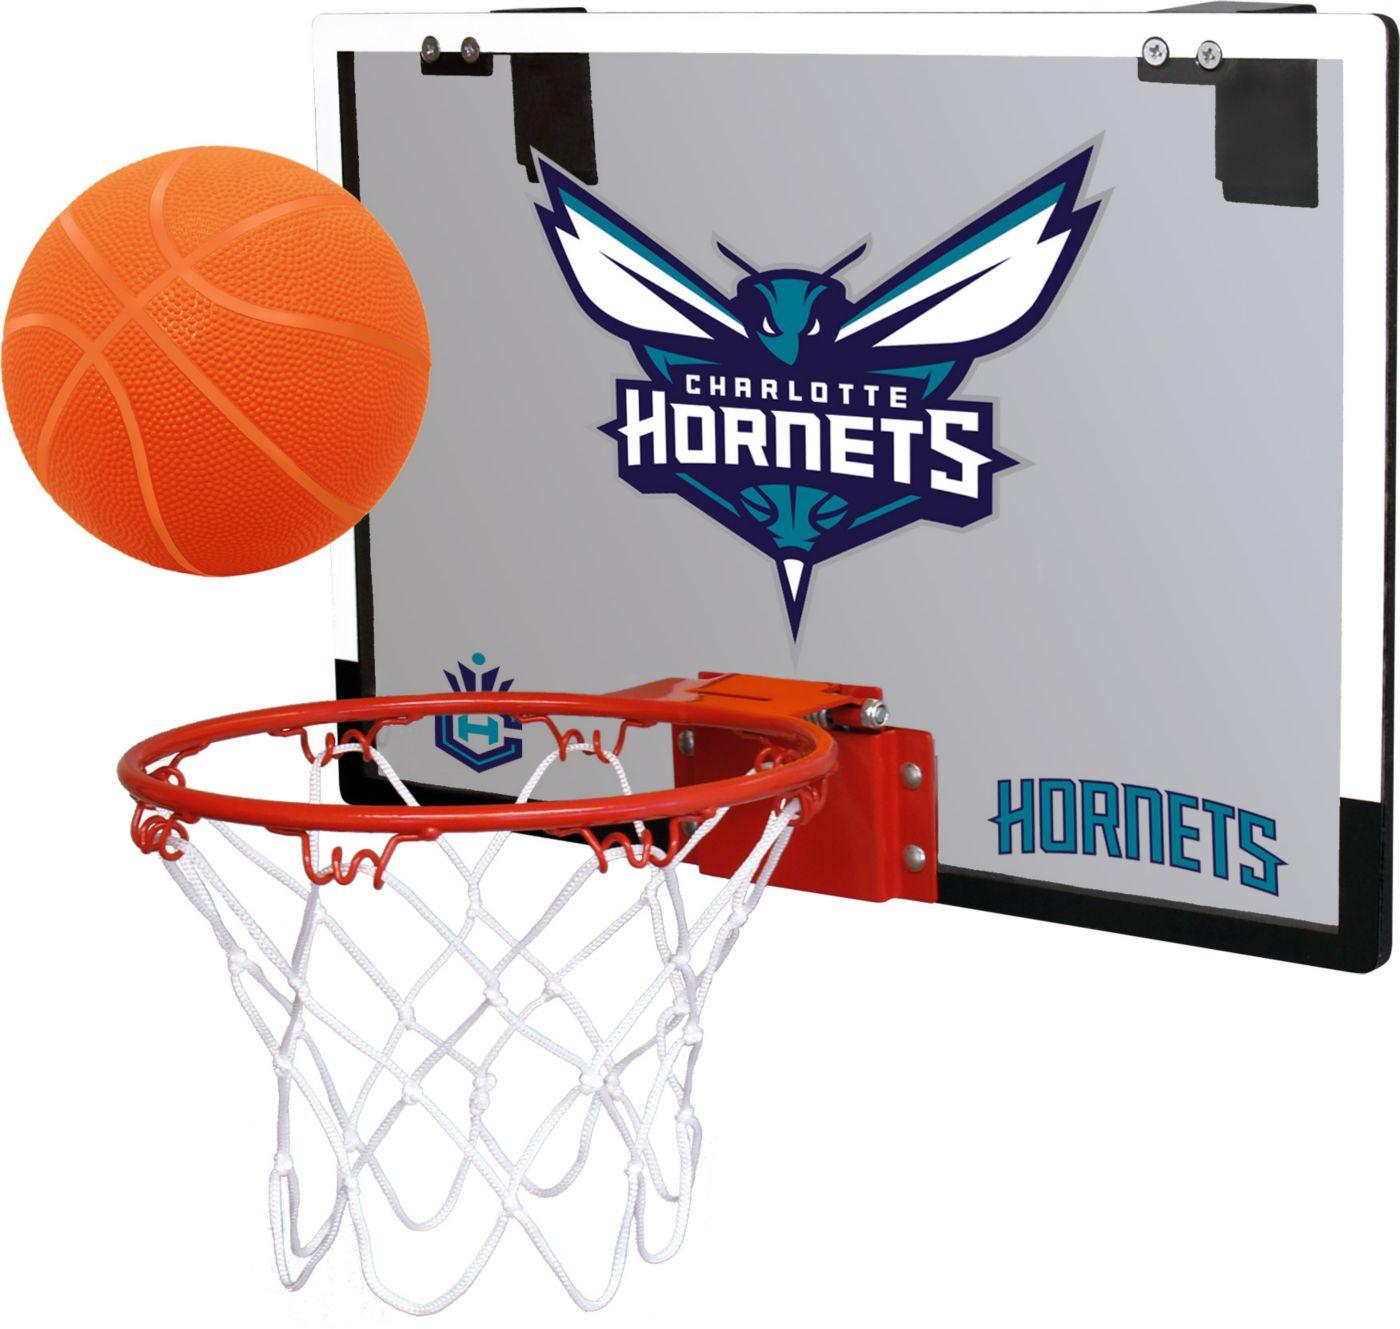 Rawlings Charlotte Hornets Game On Polycarbonate Hoop Set